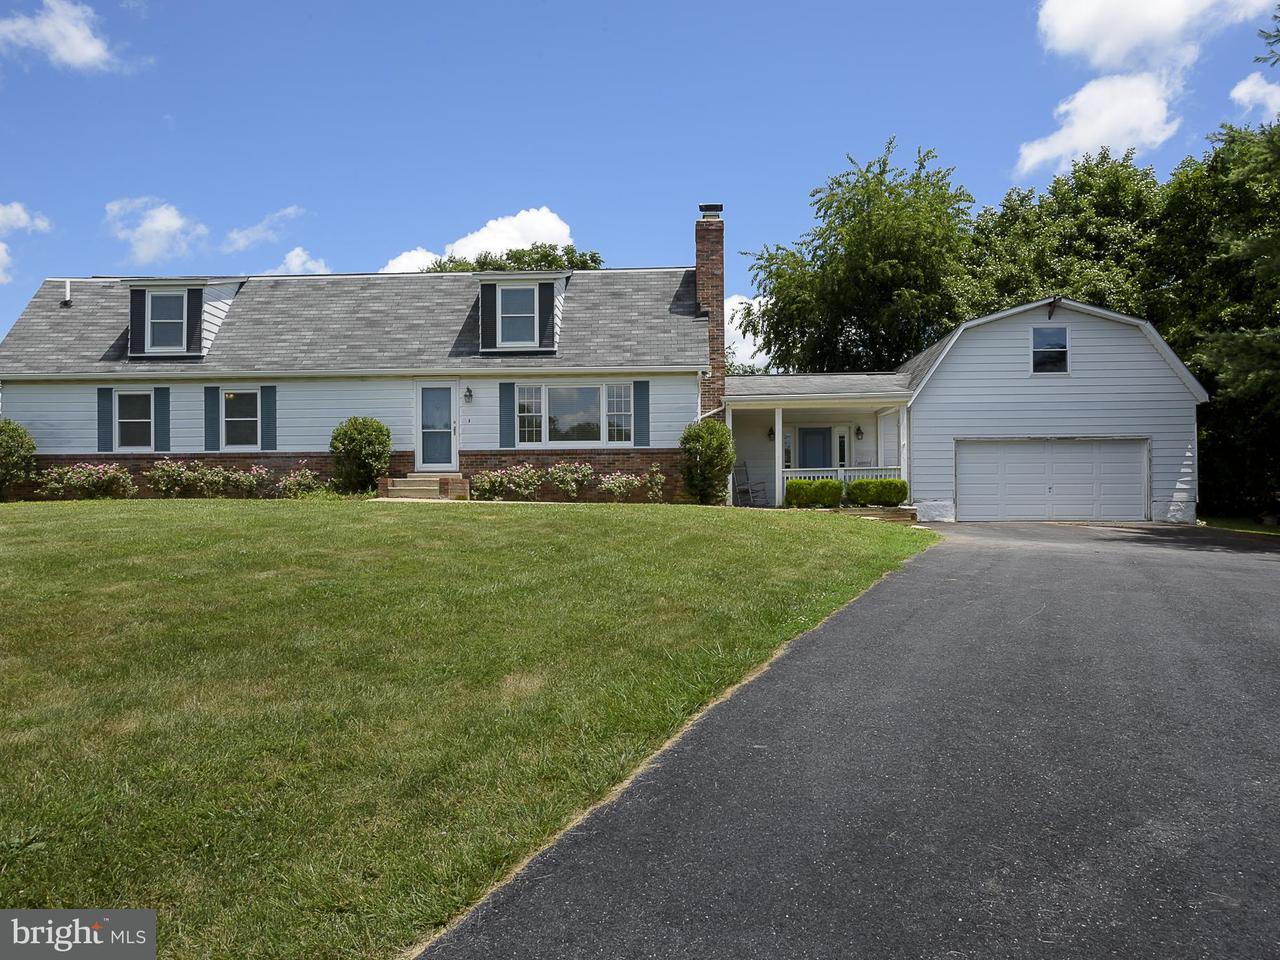 Single Family Home for Sale at 4471 TEN OAKS Road 4471 TEN OAKS Road Dayton, Maryland 21036 United States